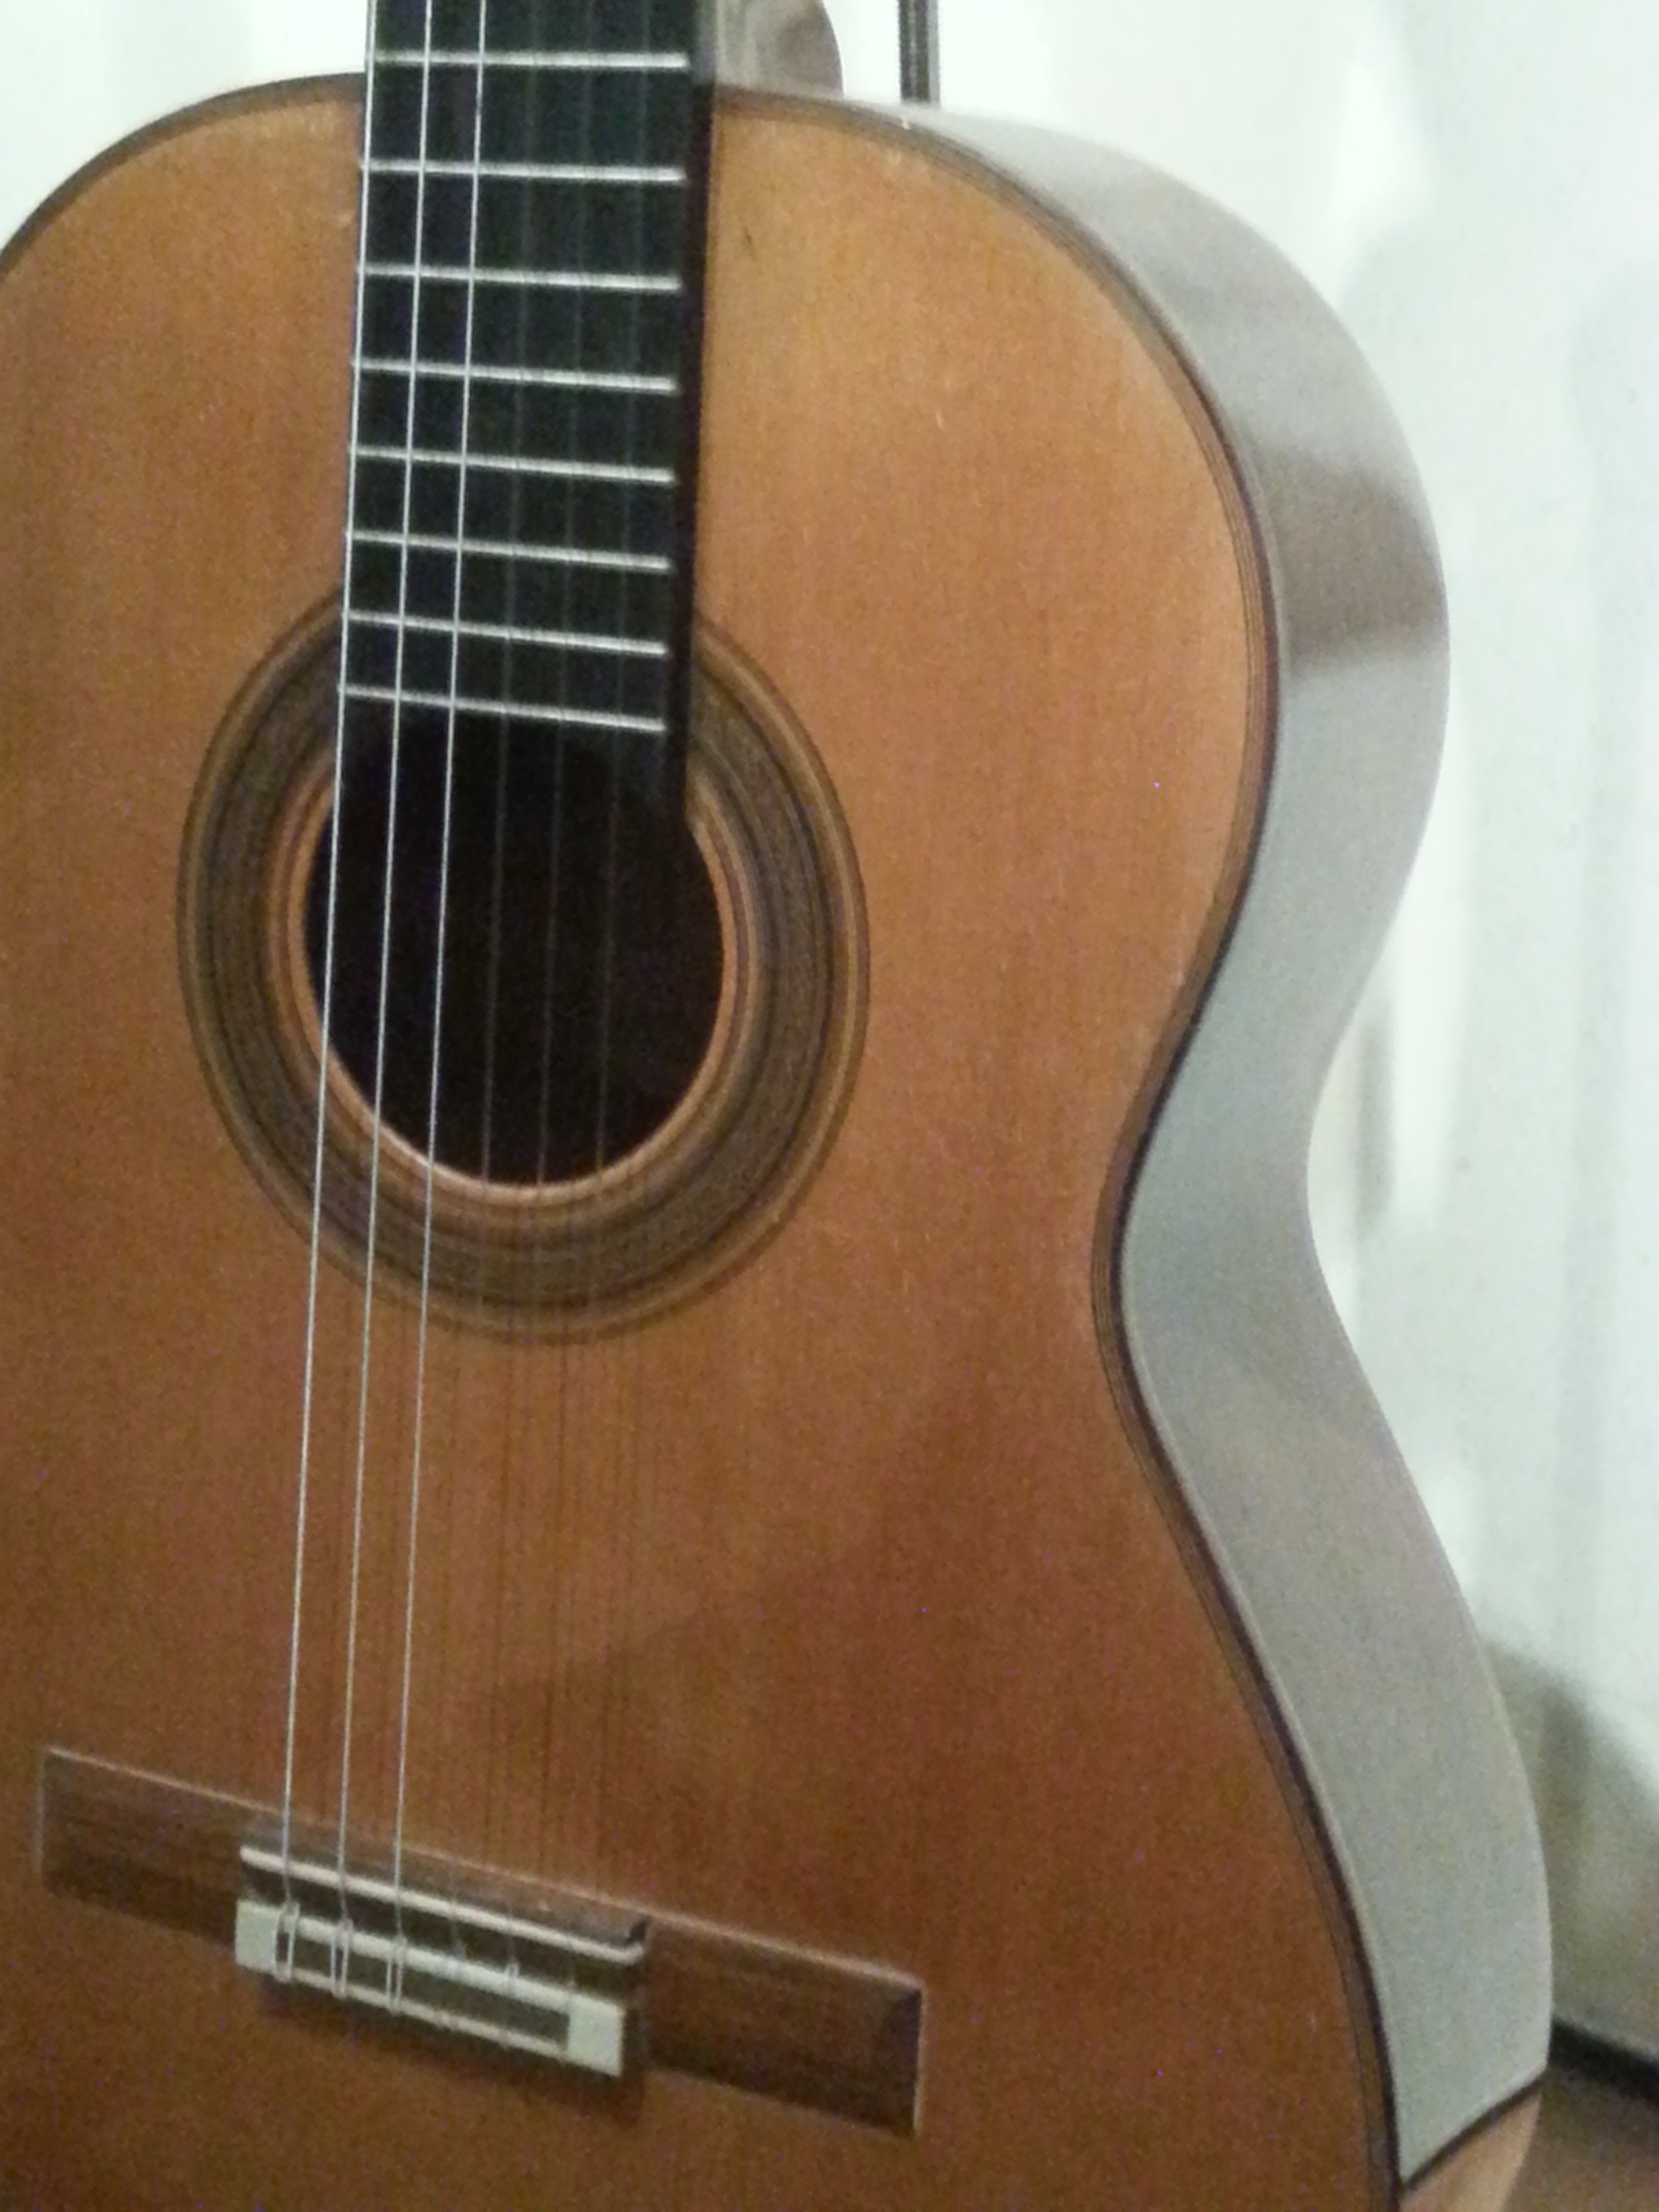 And a guitar made by Robert bouchet